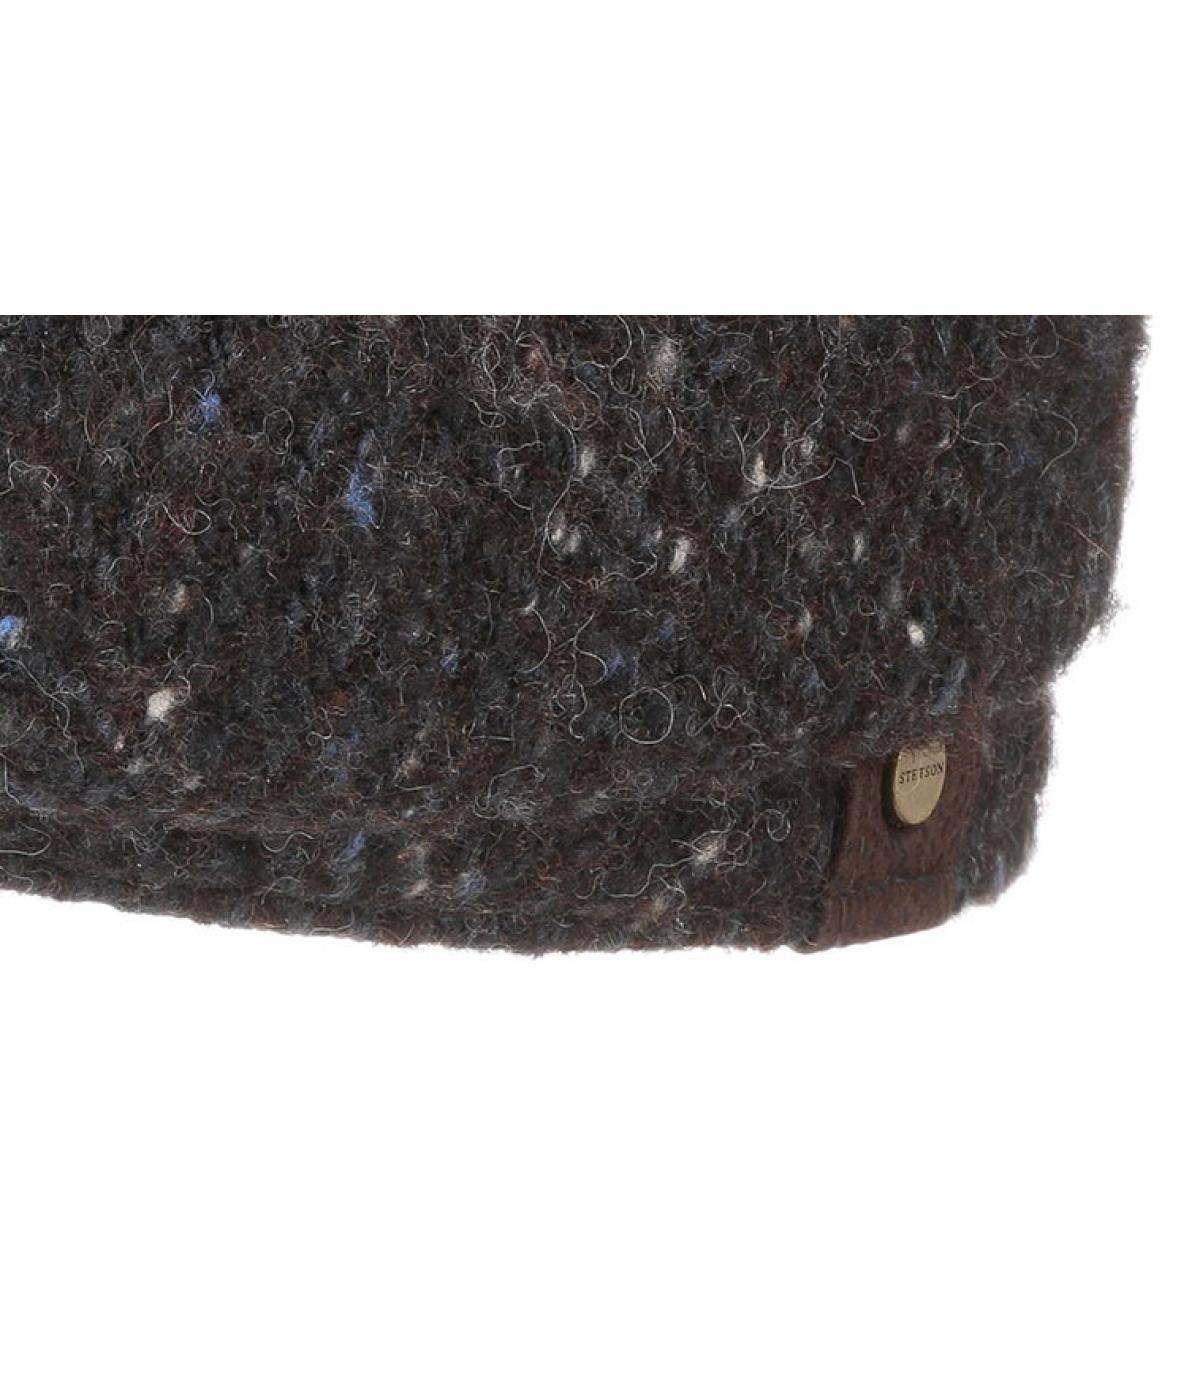 Dettagli Hatteras Herringbone  blue brown - image 3